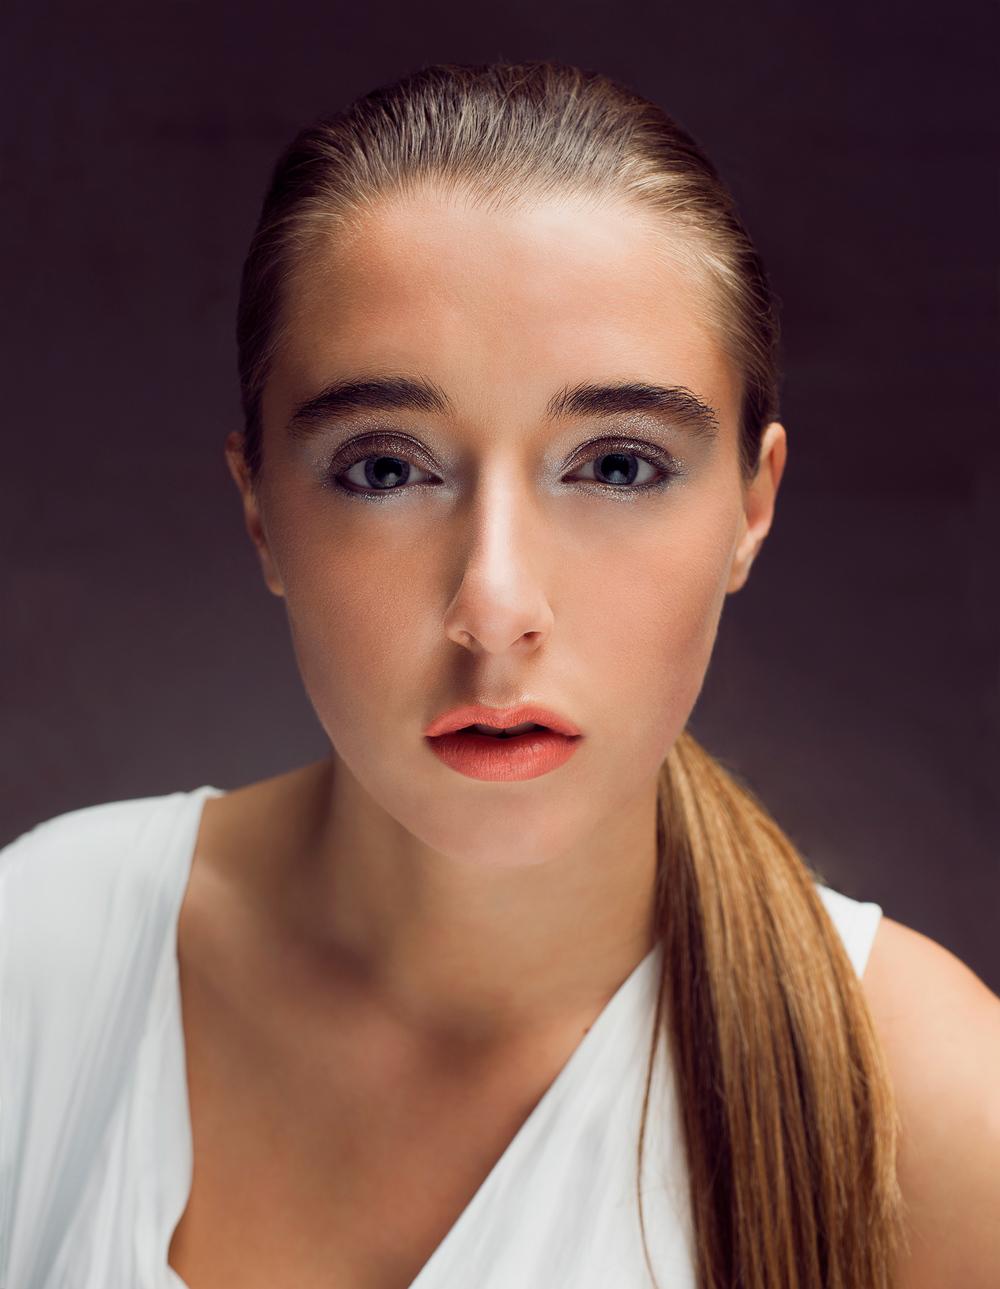 Lily_Portrait.jpg